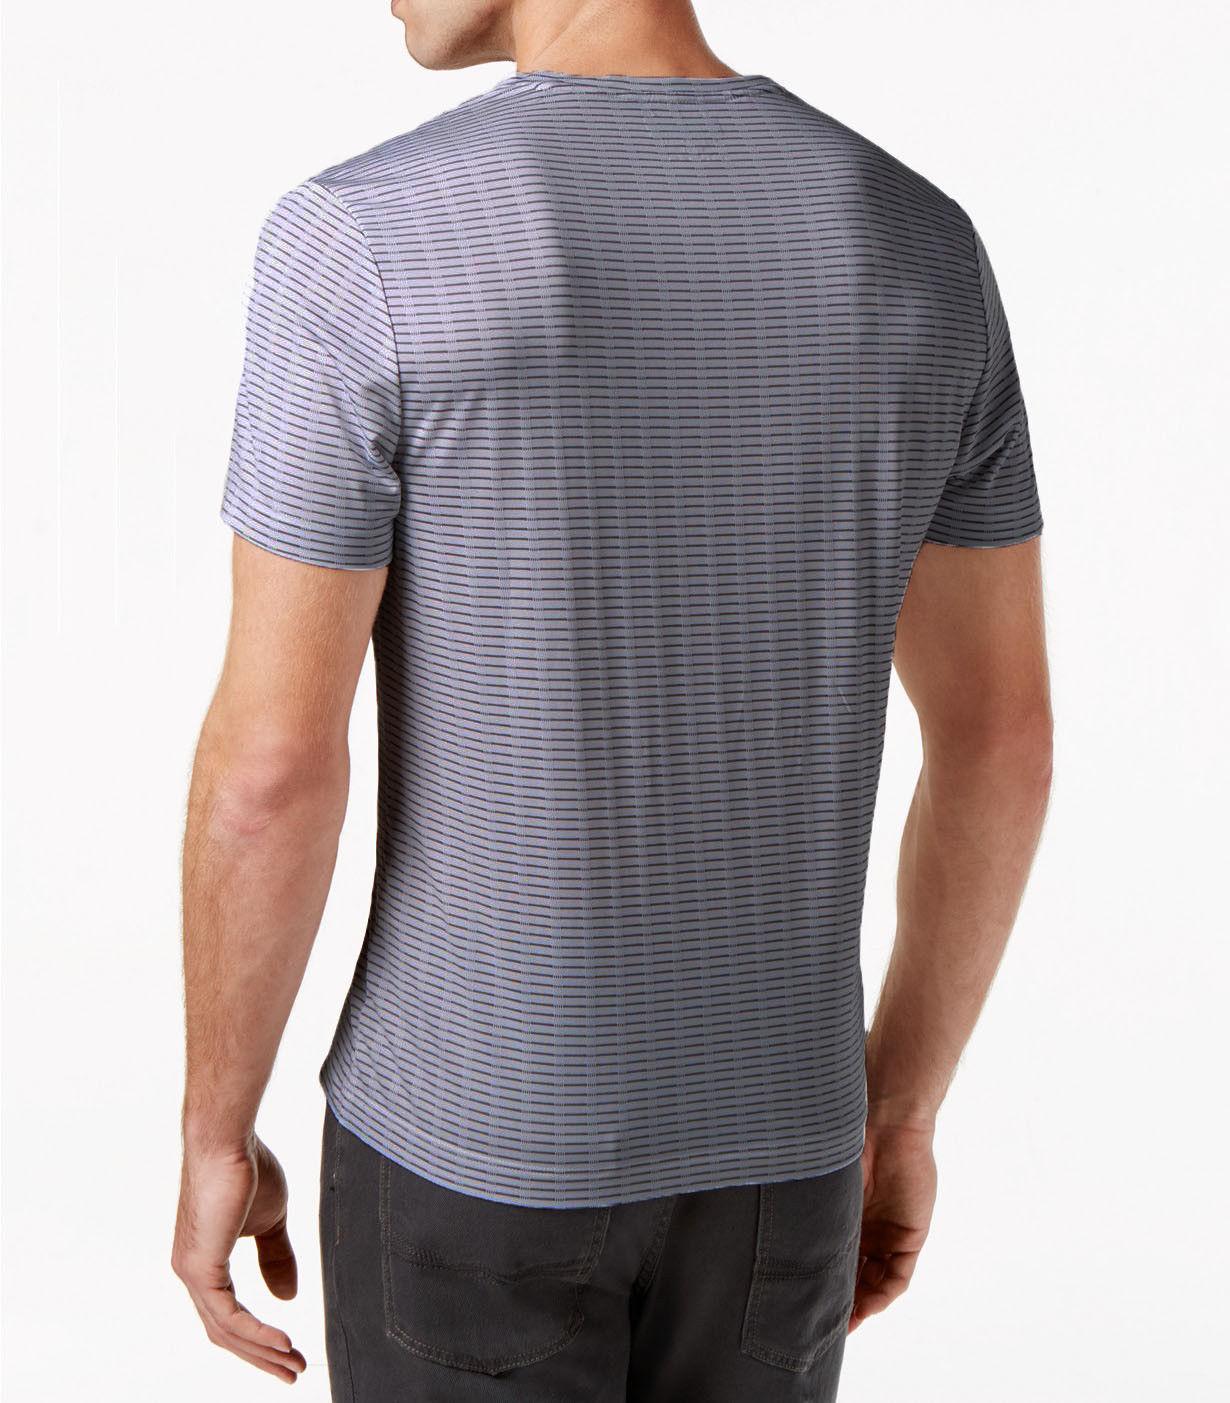 Alfani Men's Bar-Striped Performance T-Shirt, Size M, MSRP $45